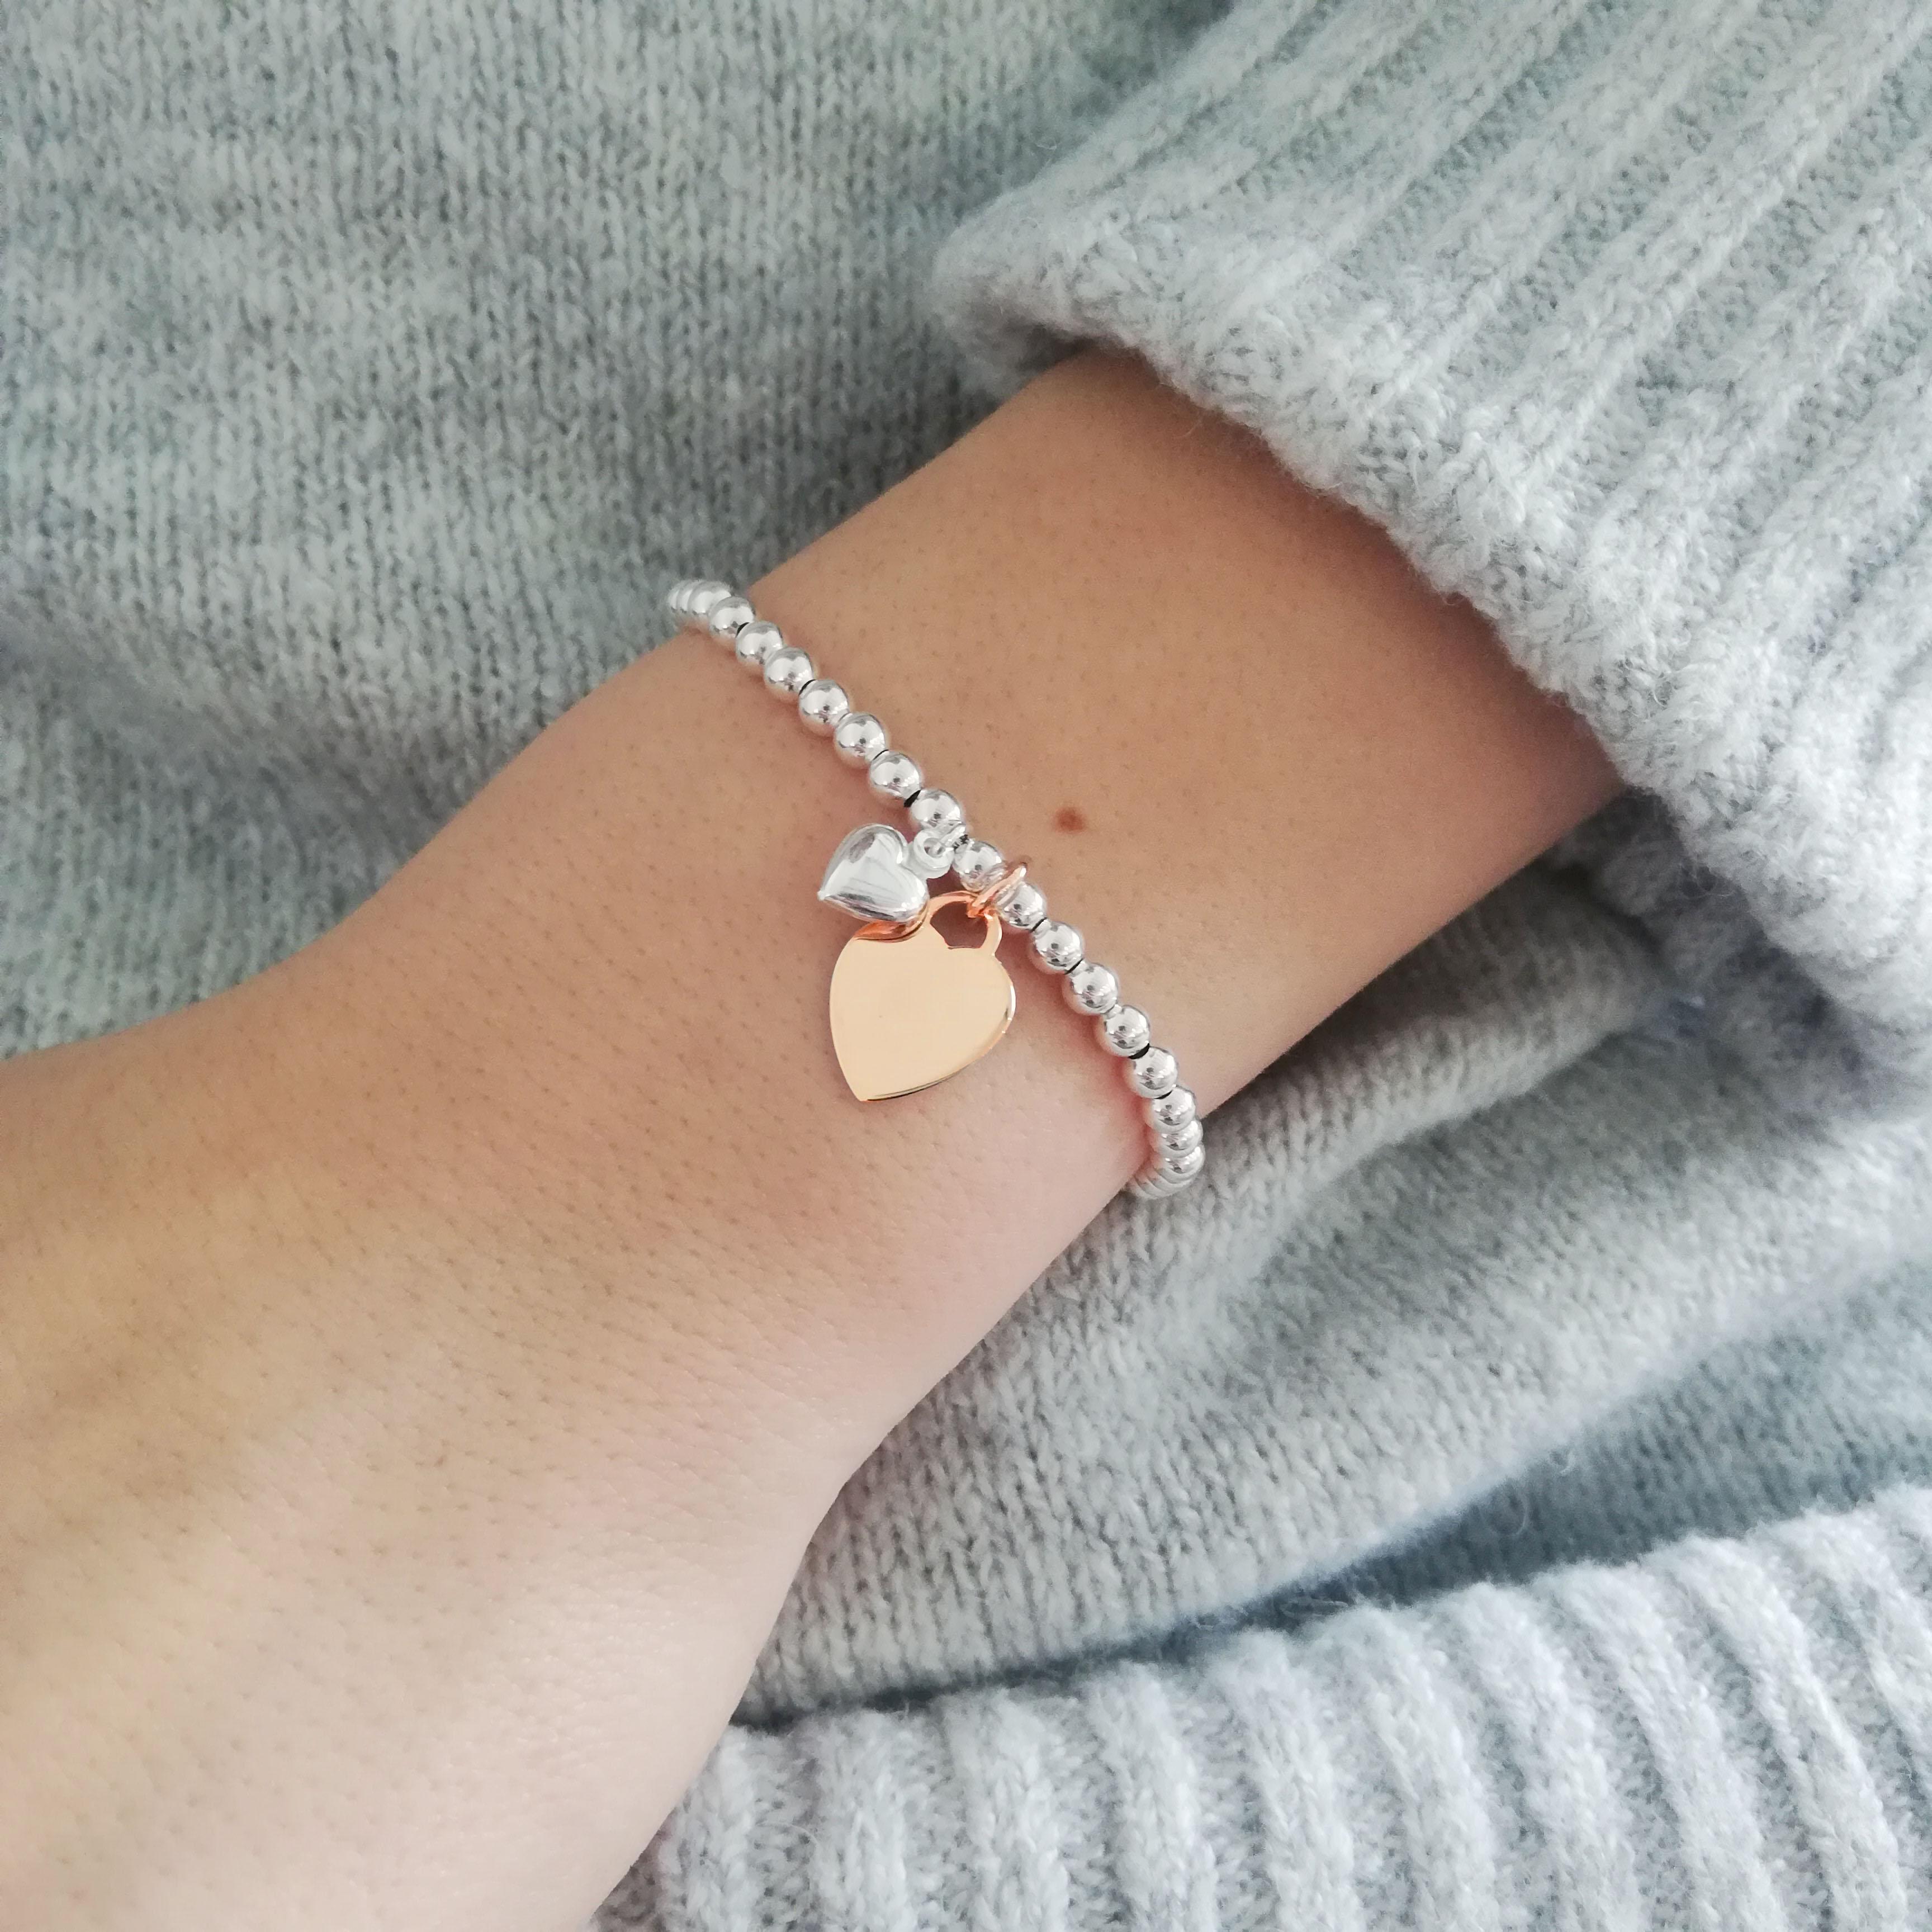 Rose Gold Vermeil Ball Slider Bracelet With Engraved Rose Gold Heart Charm